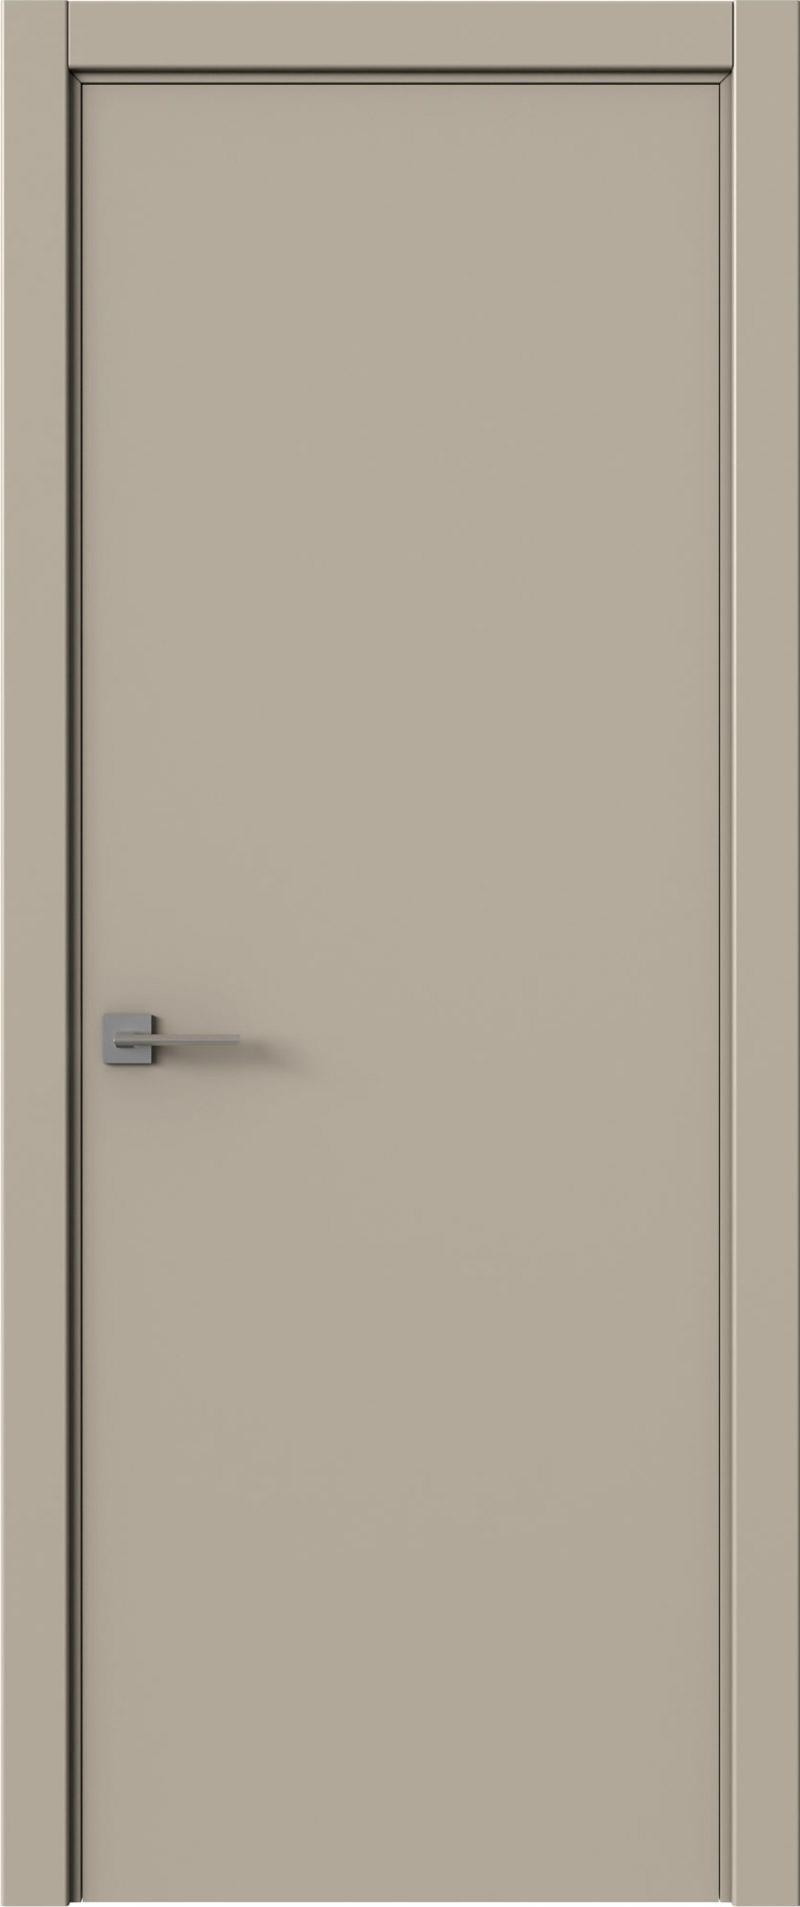 Tivoli А-2 цвет - Серо-оливковая эмаль (RAL 7032) Без стекла (ДГ)